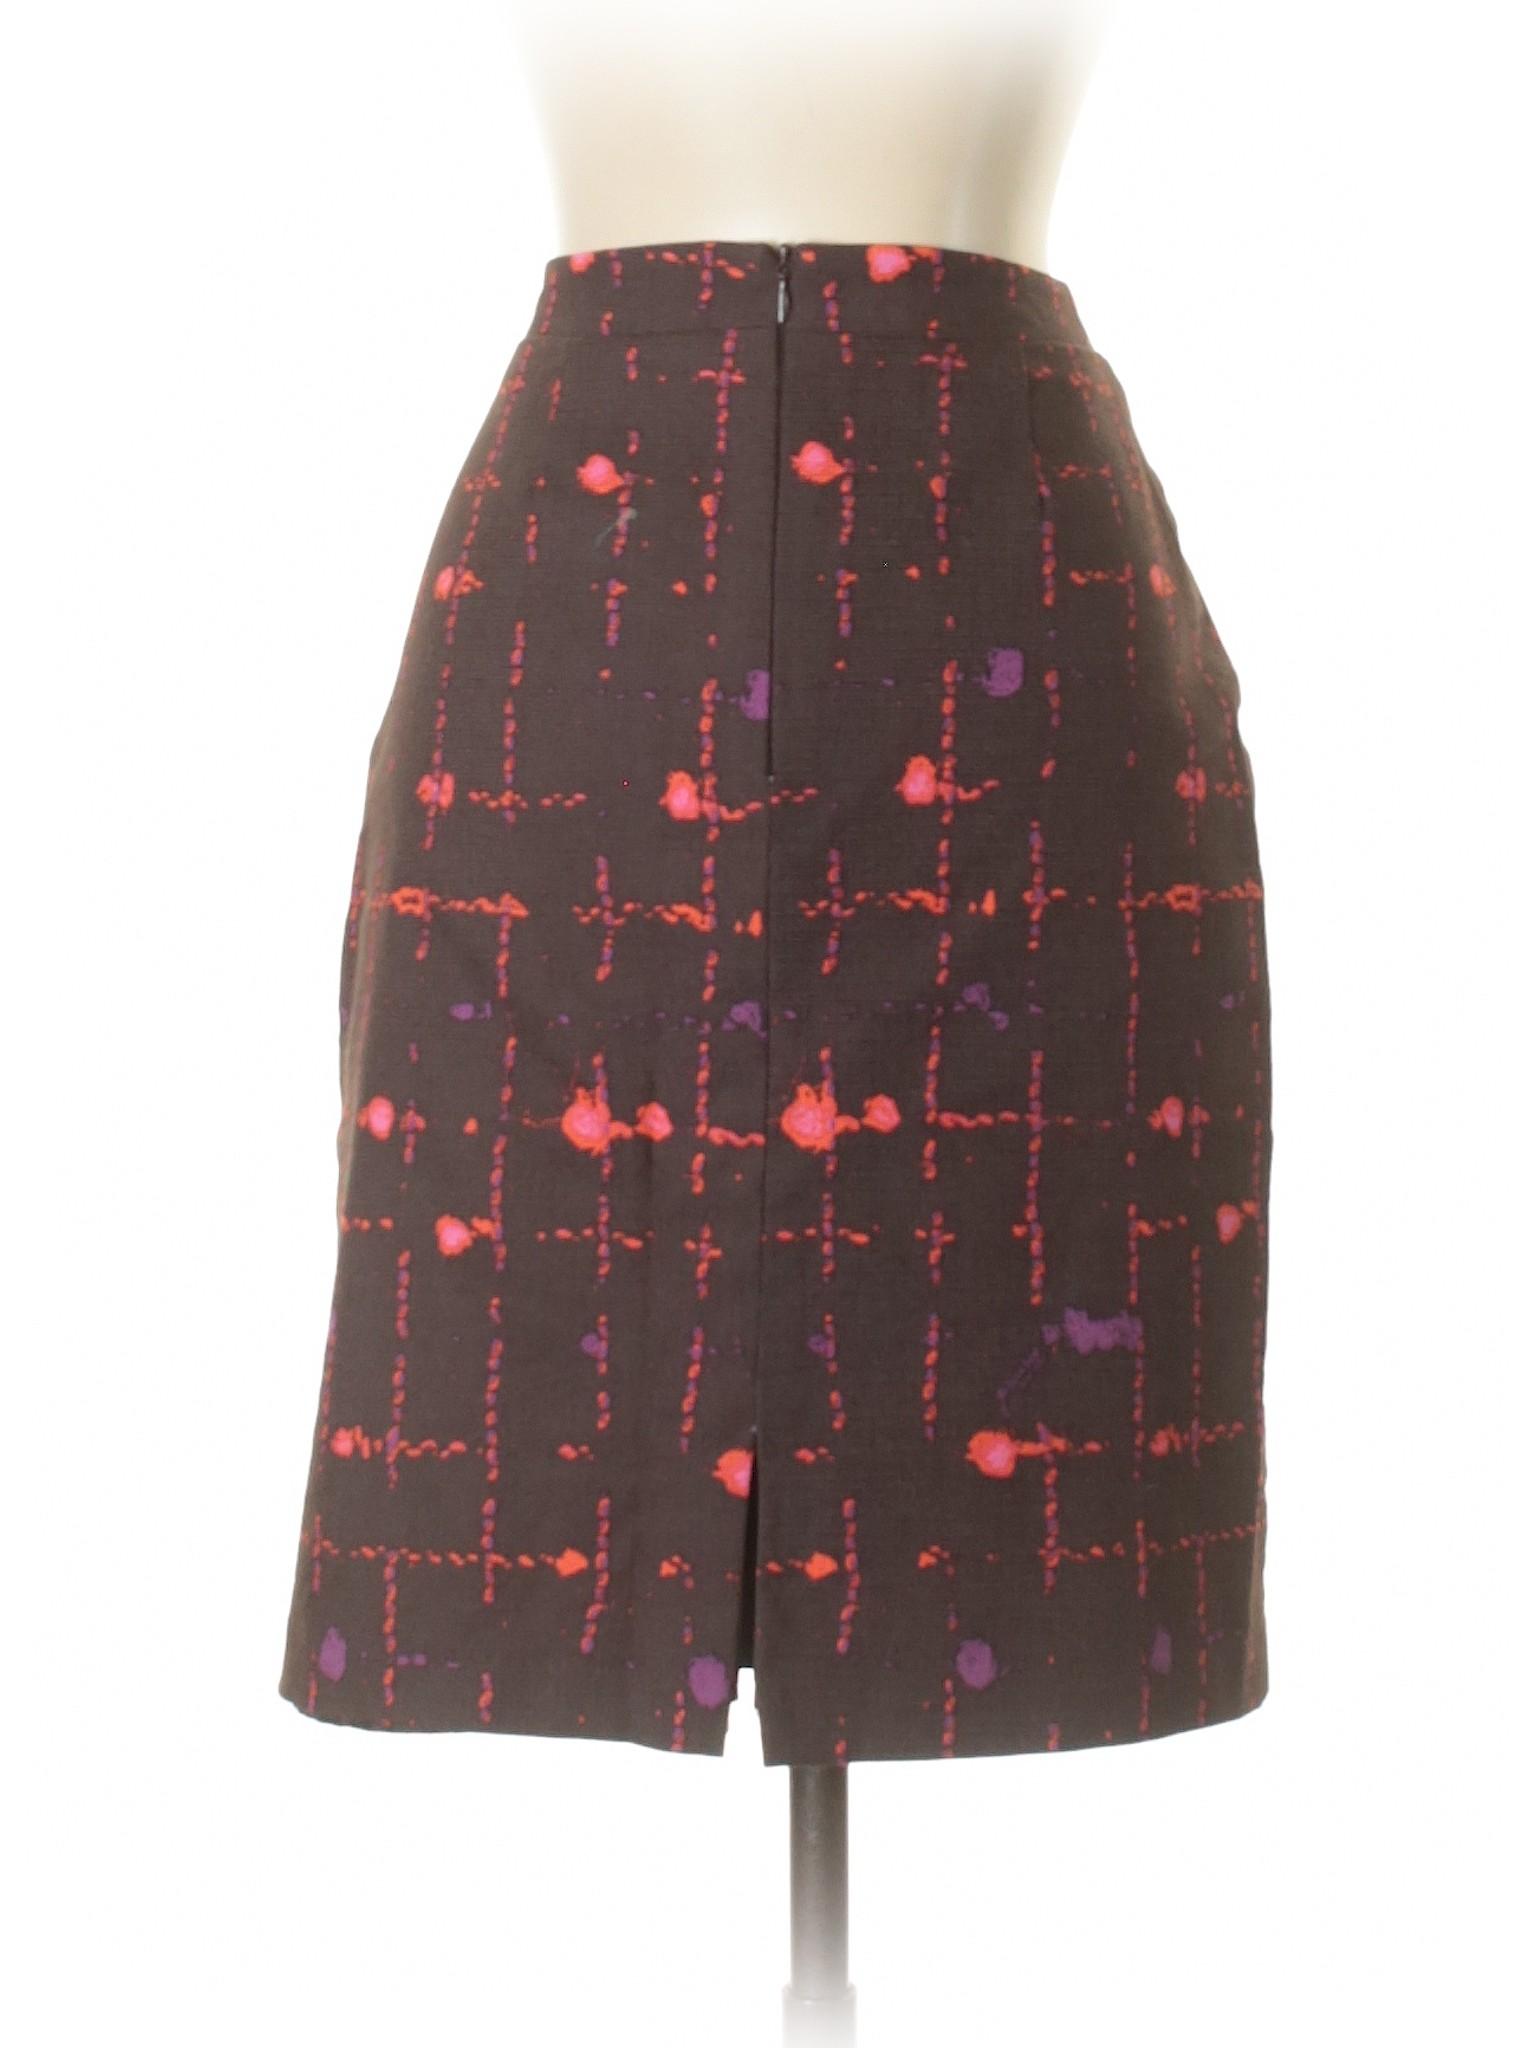 New leisure Casual Boutique Prairie York Skirt wESAHP